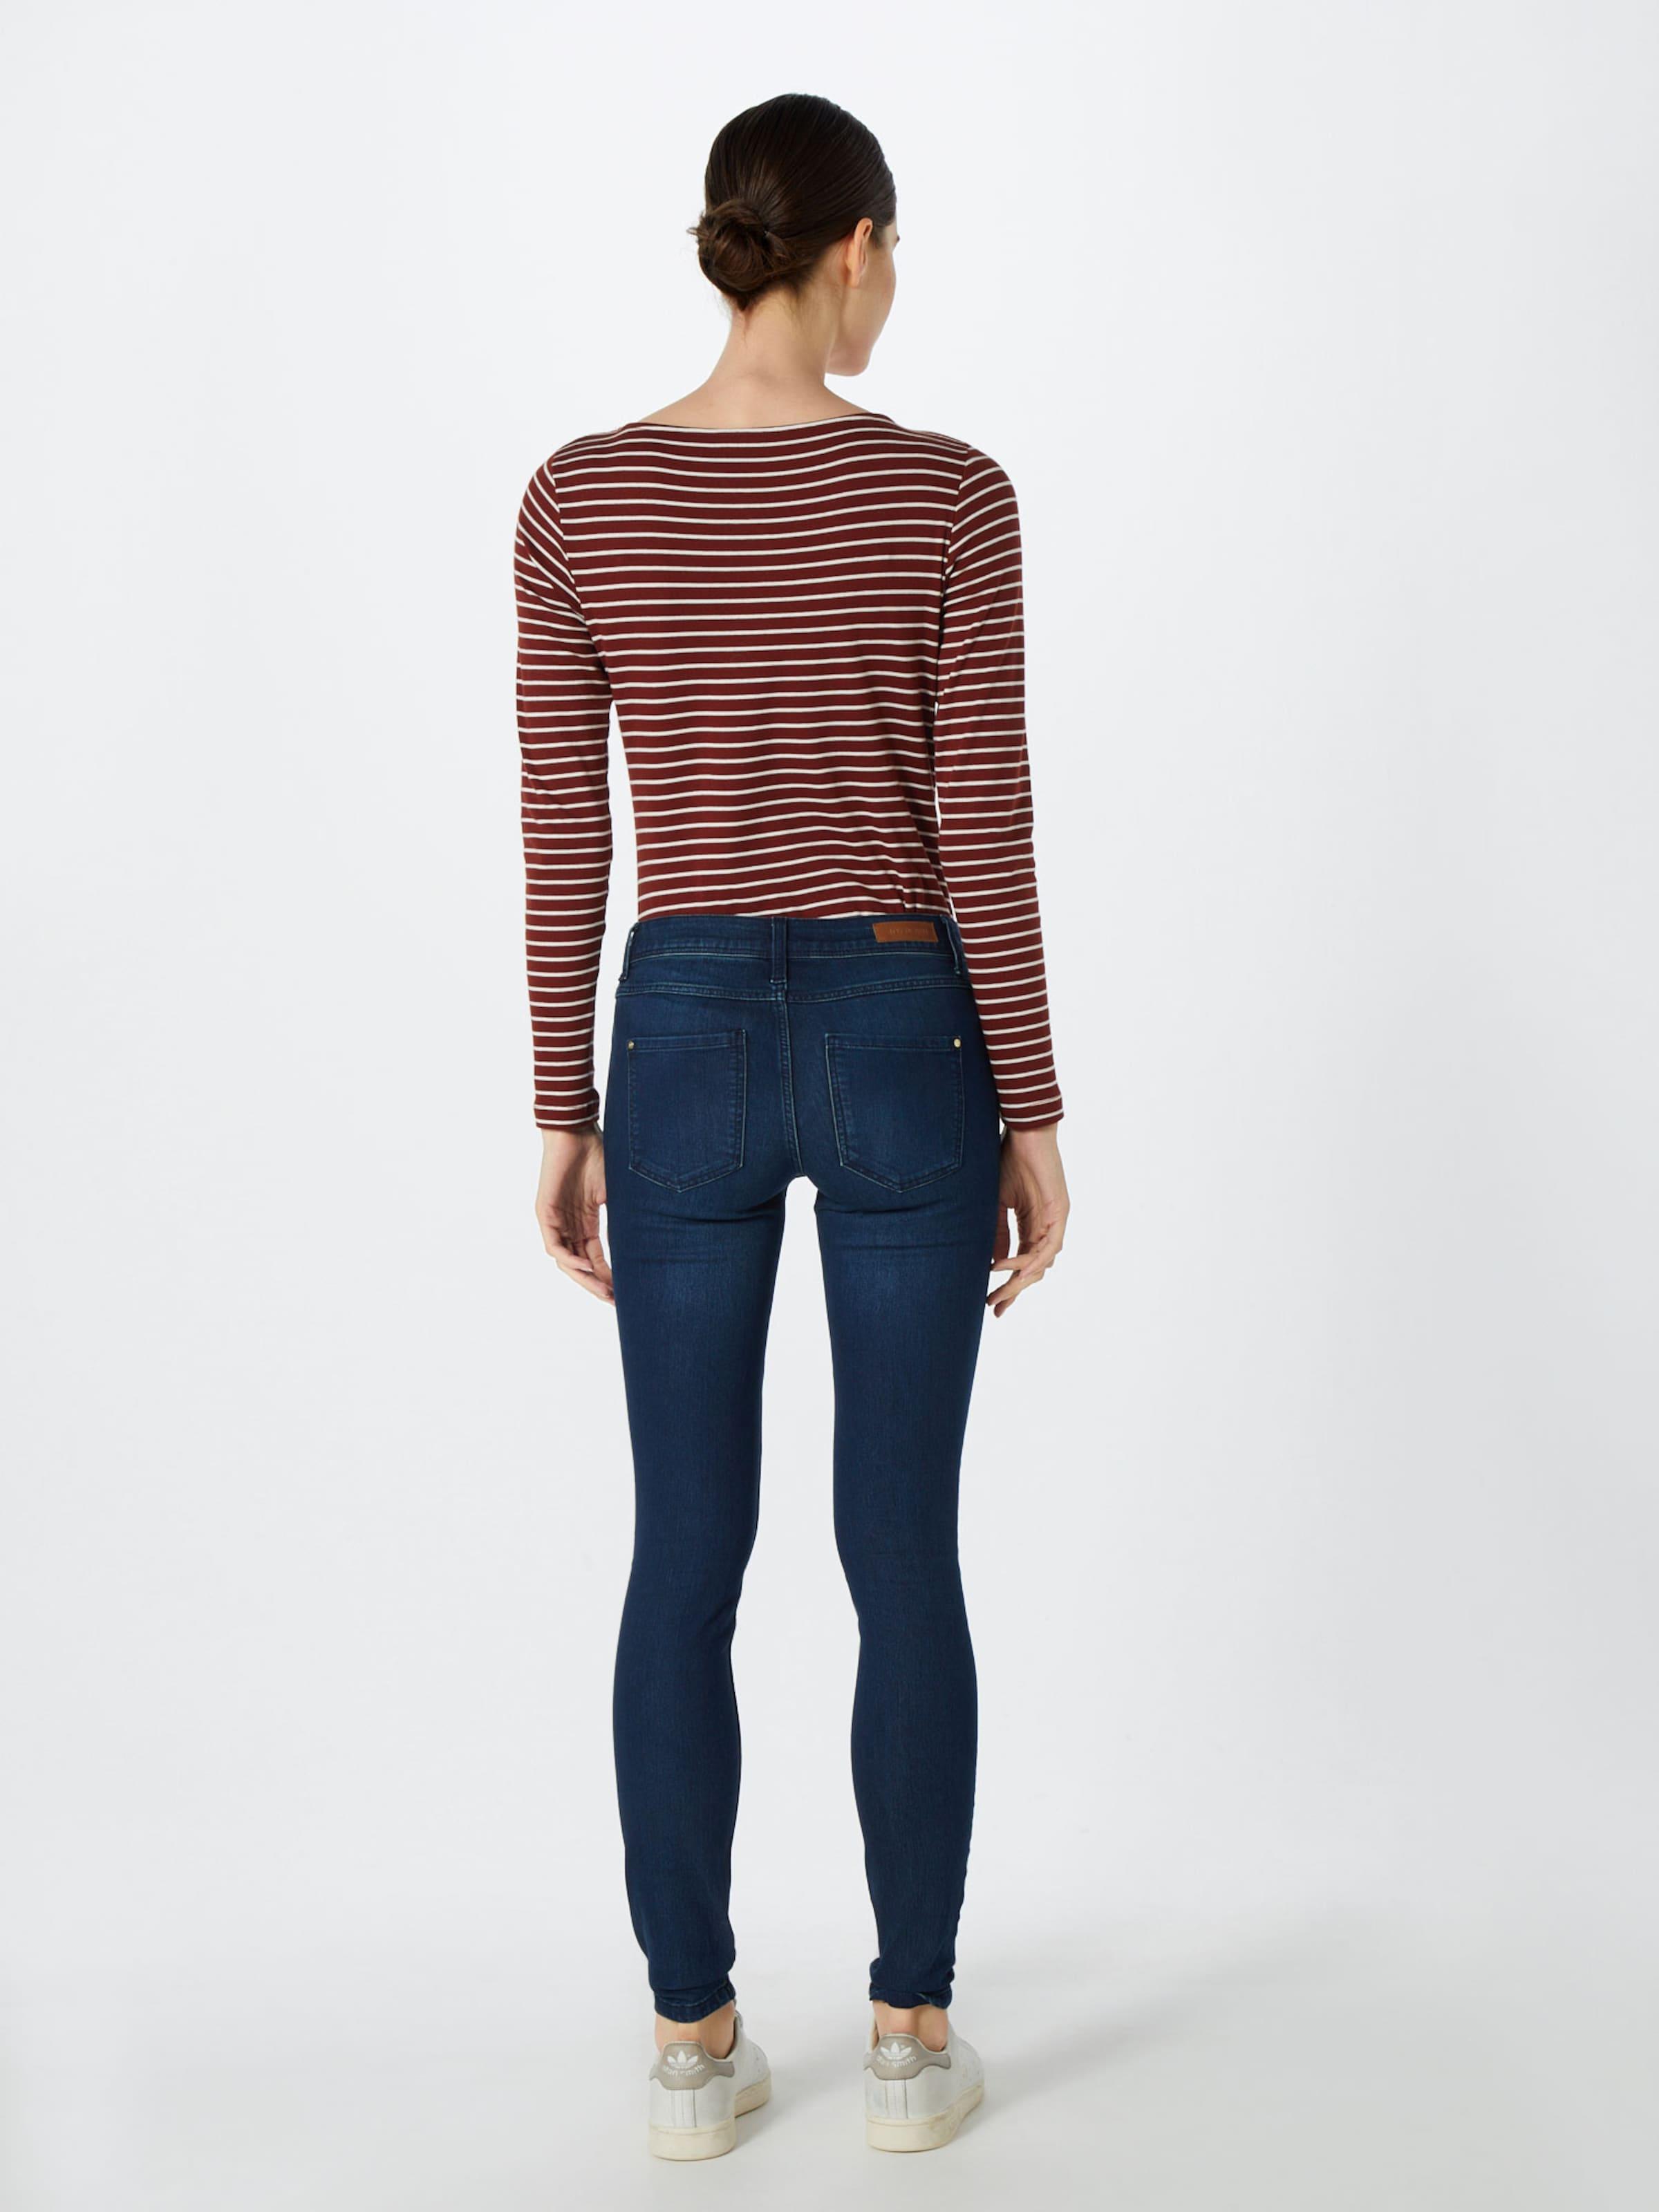 De Jacqueline Blauw Denim In 'jdyflora D Dnm' Jeans Skinny Rw Blue Yong L4ARj5